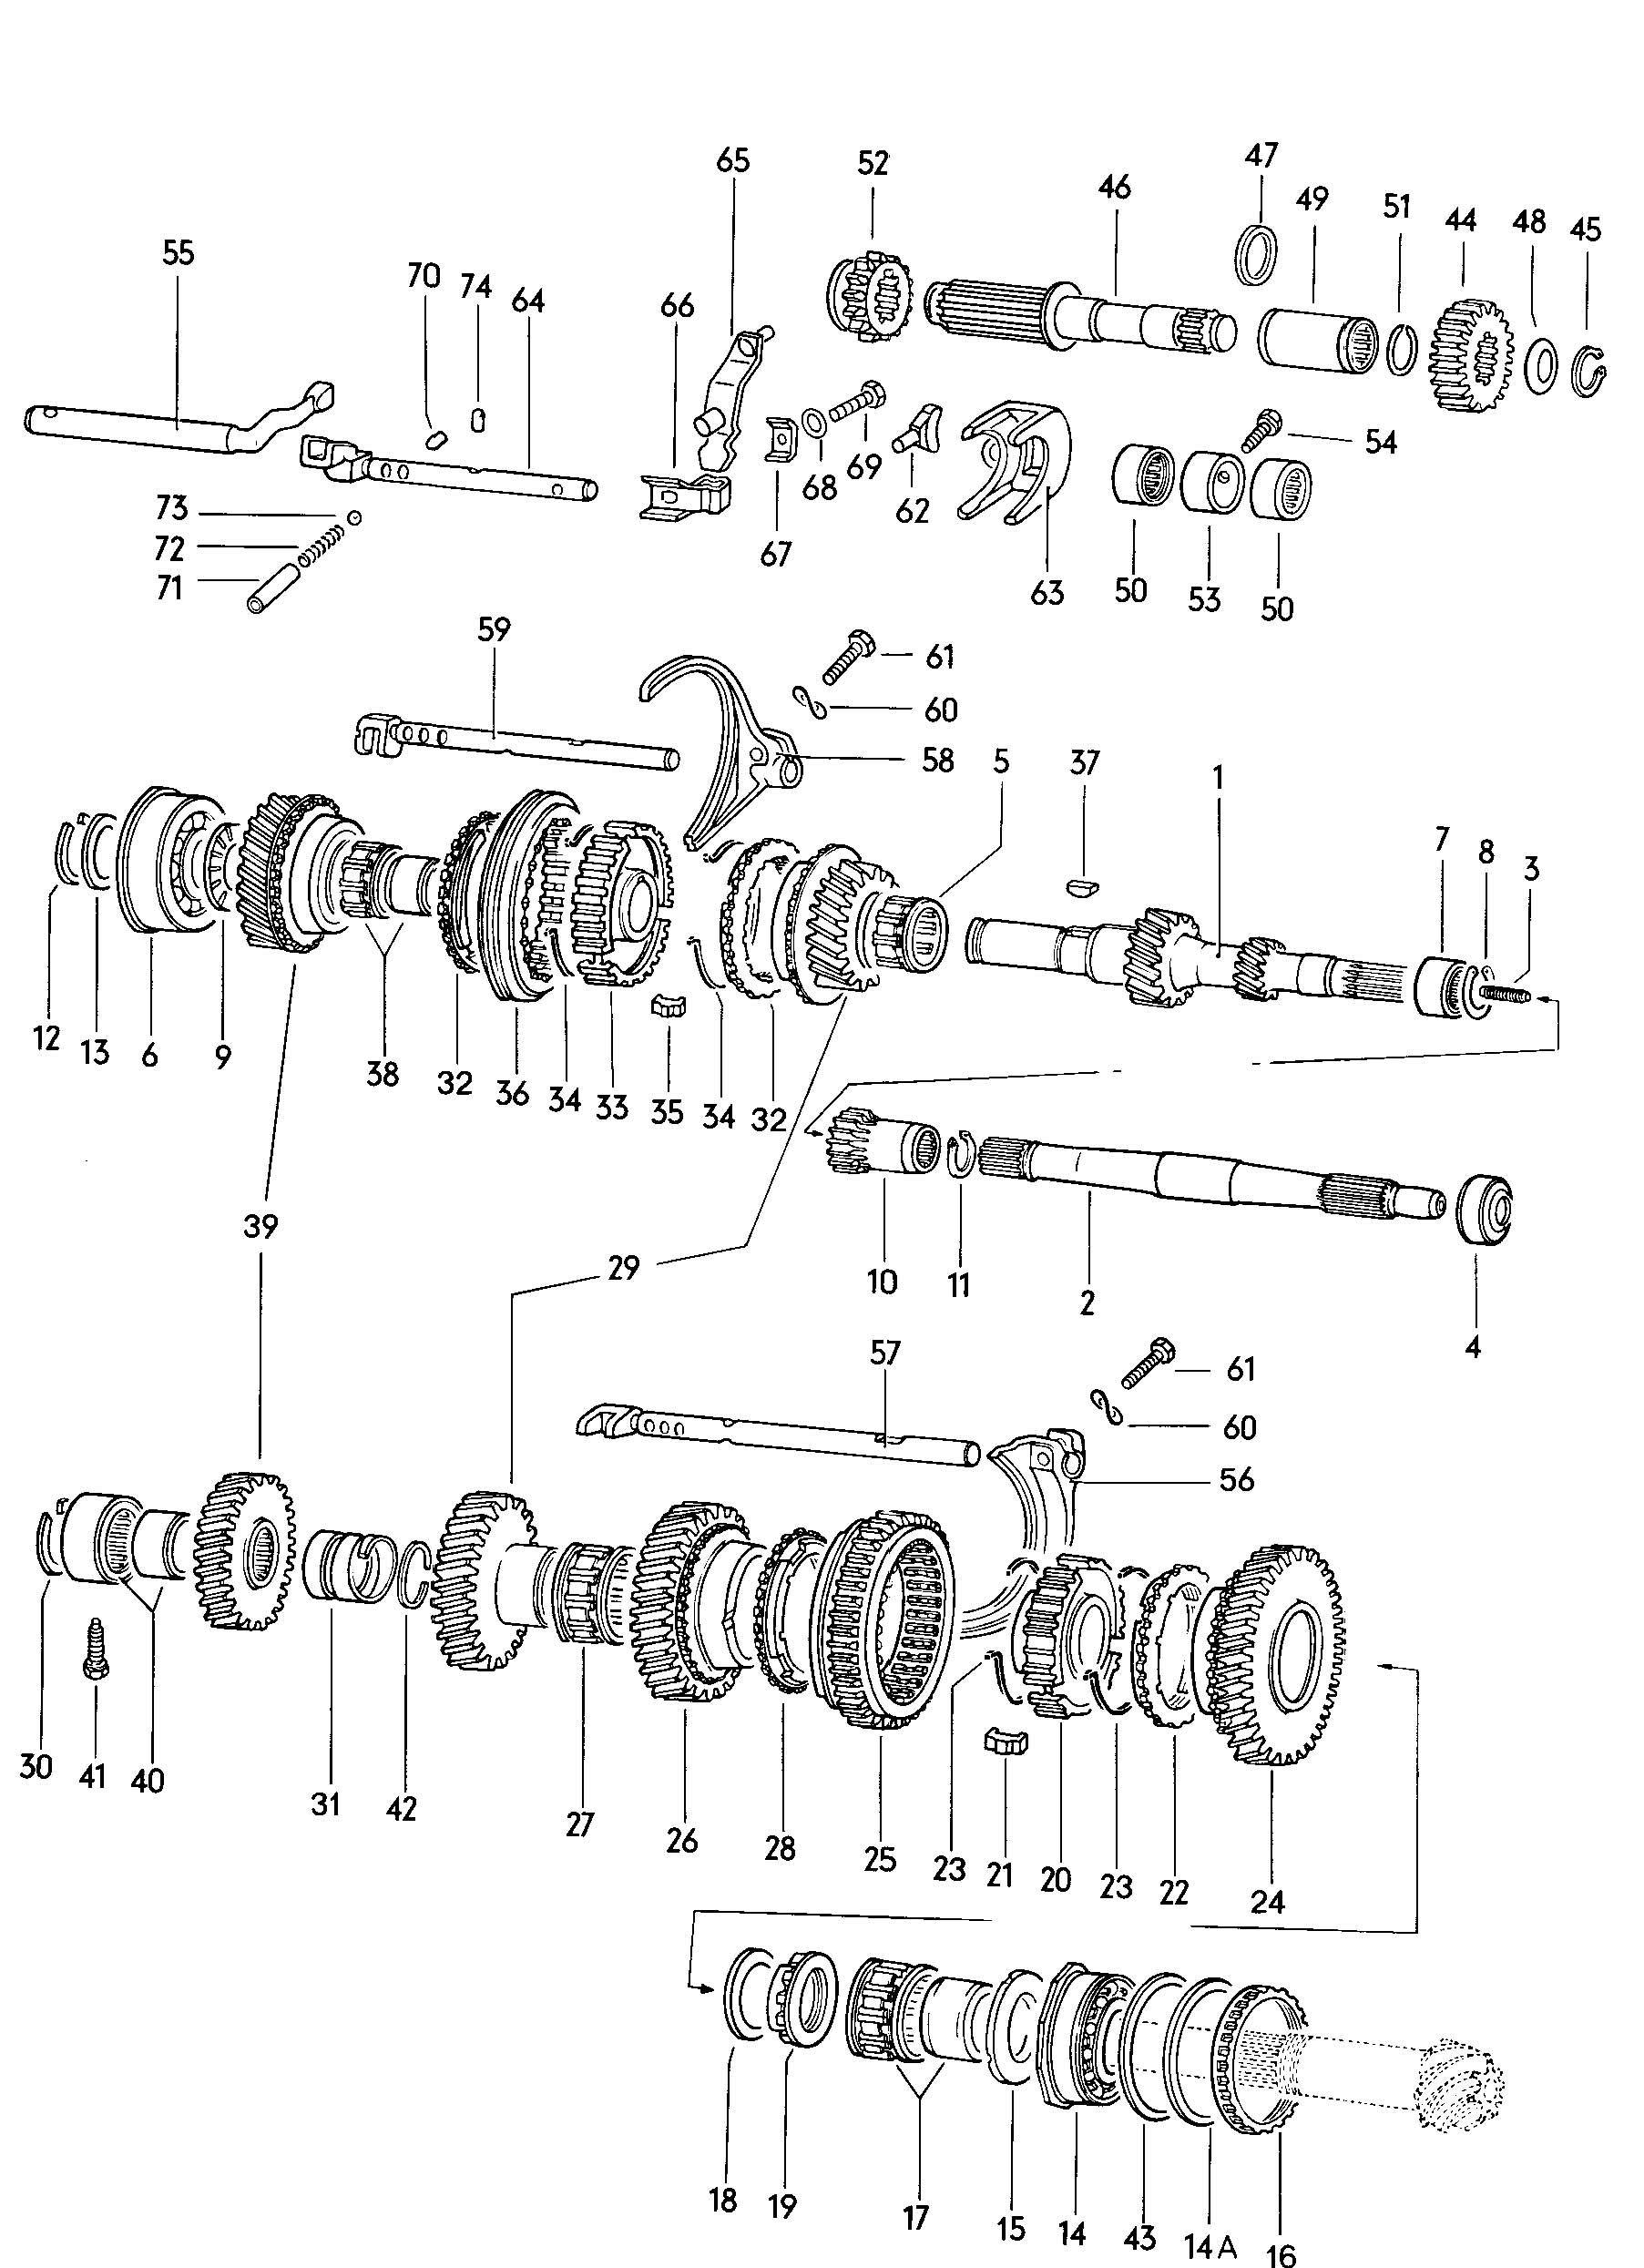 Gears And Shafts Manual Transmission Volkswagen  Vw